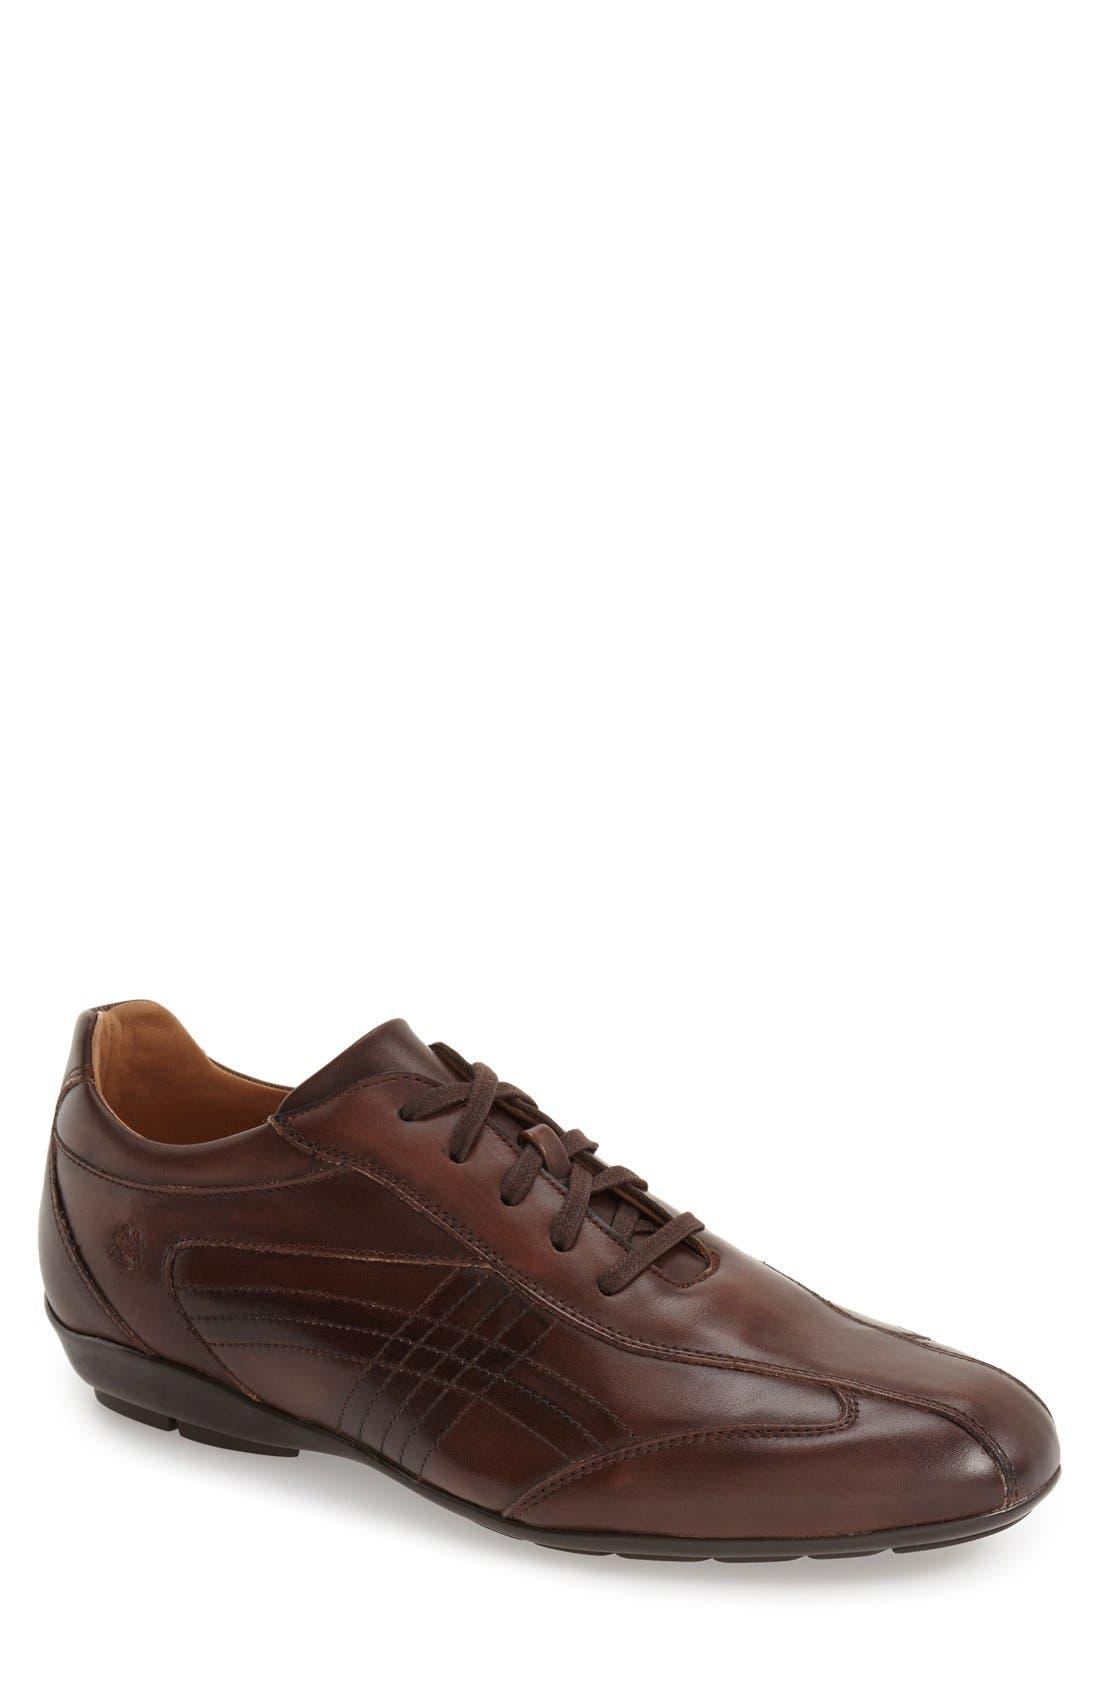 'Castelar' Lace-Up Sneaker,                             Main thumbnail 2, color,